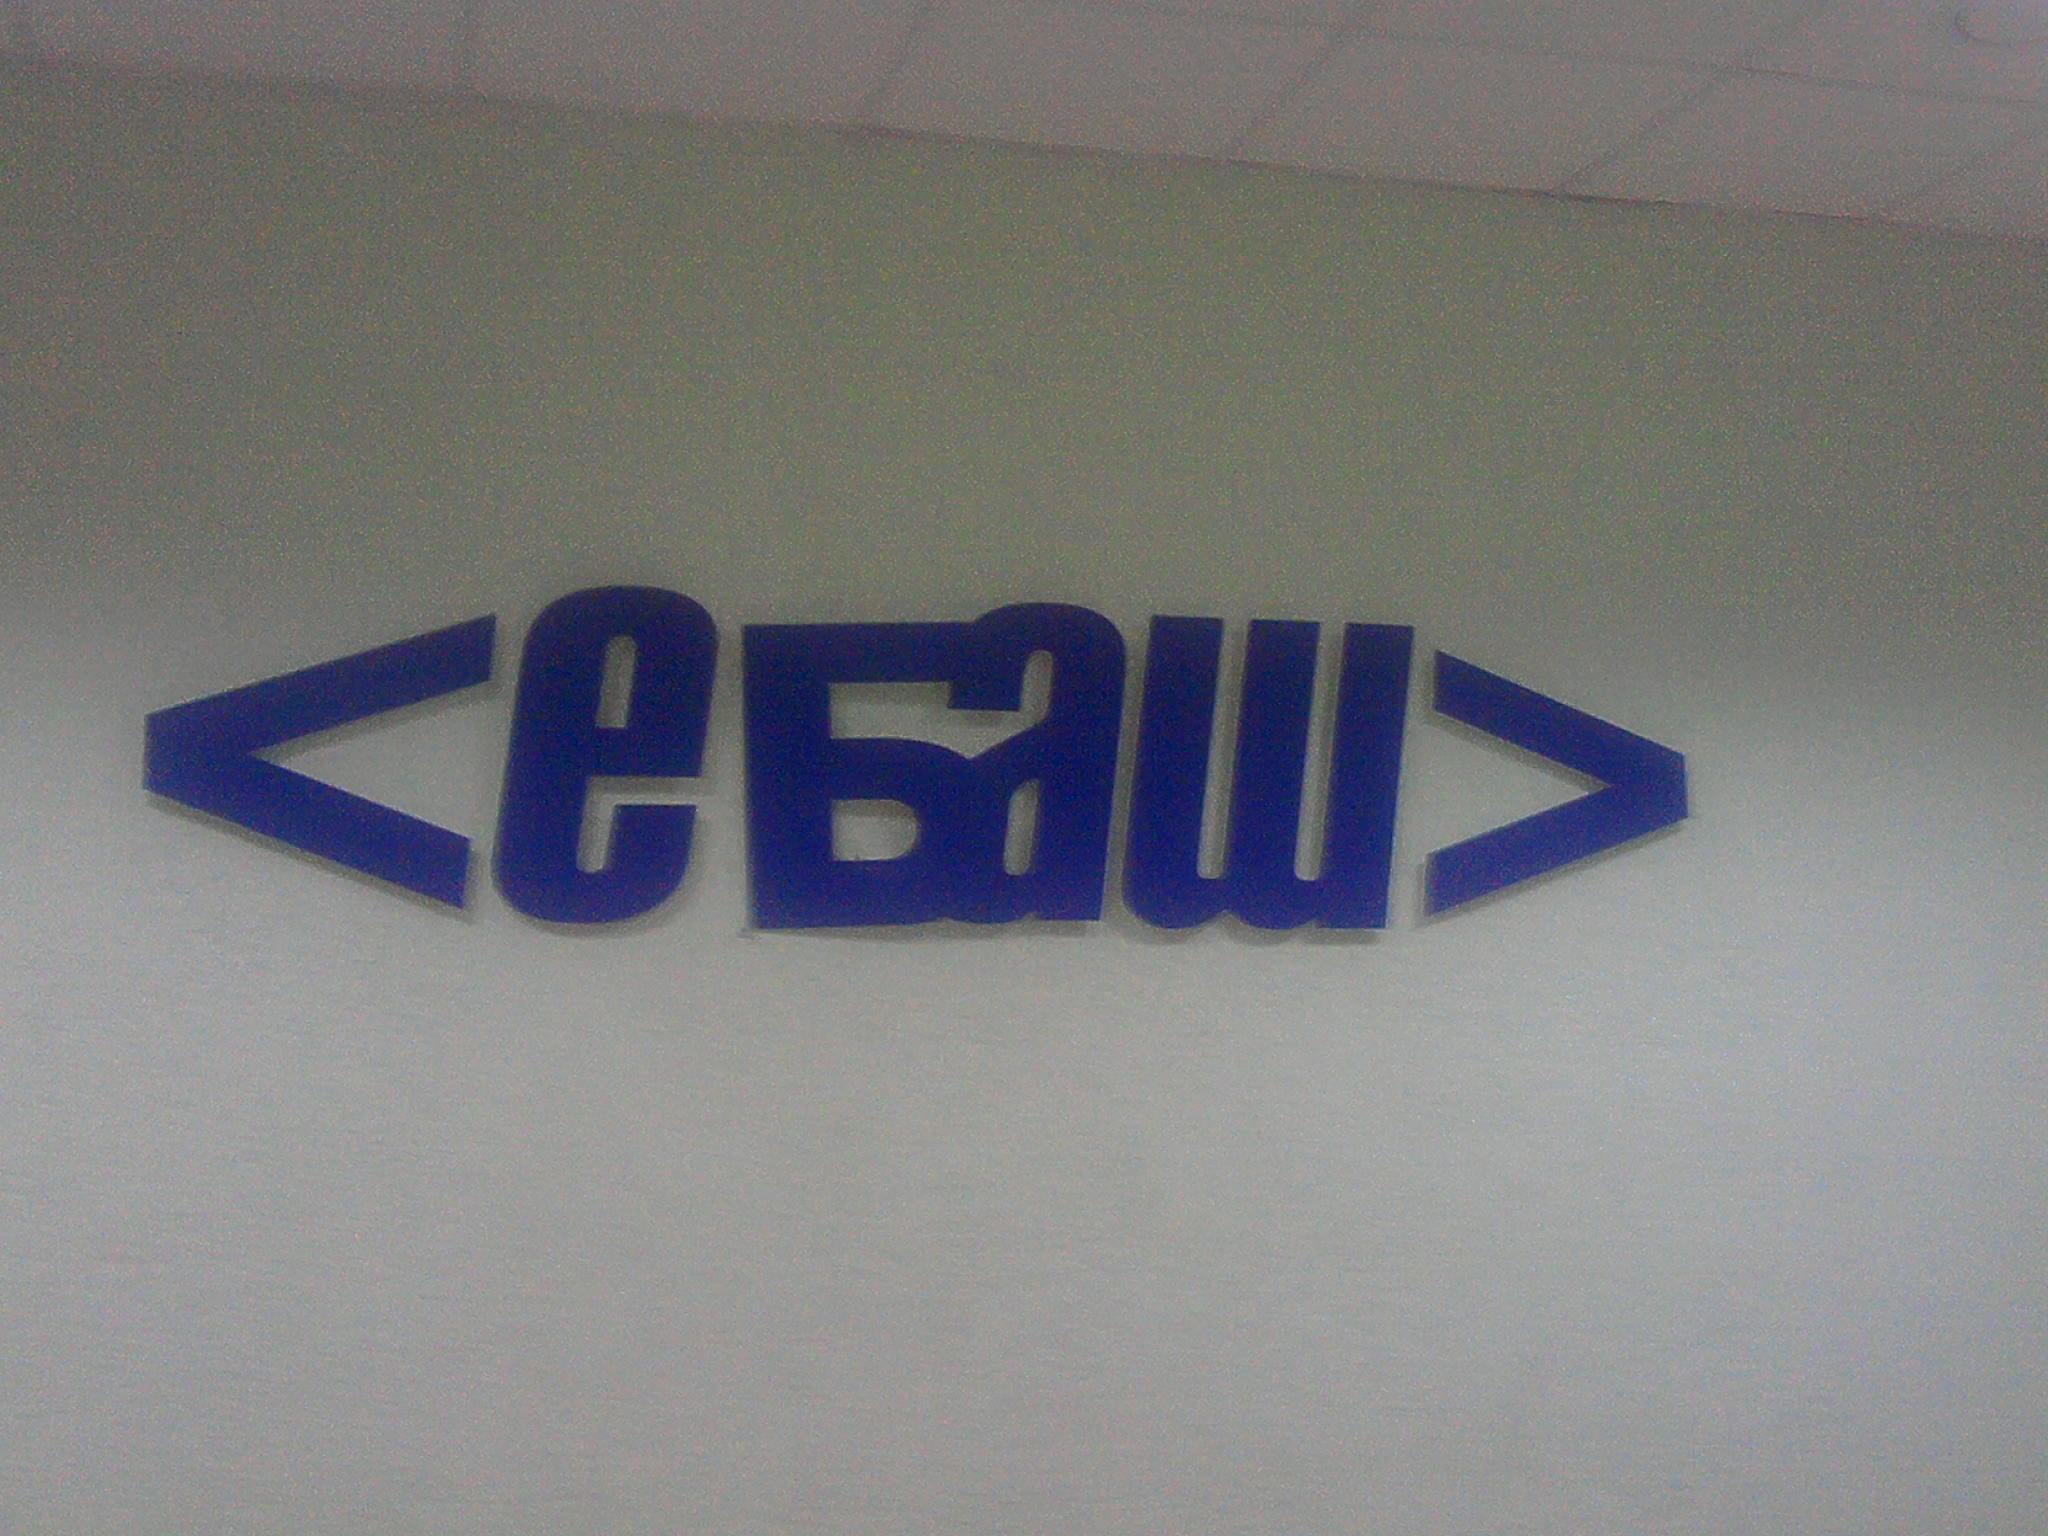 В epam - ебаш